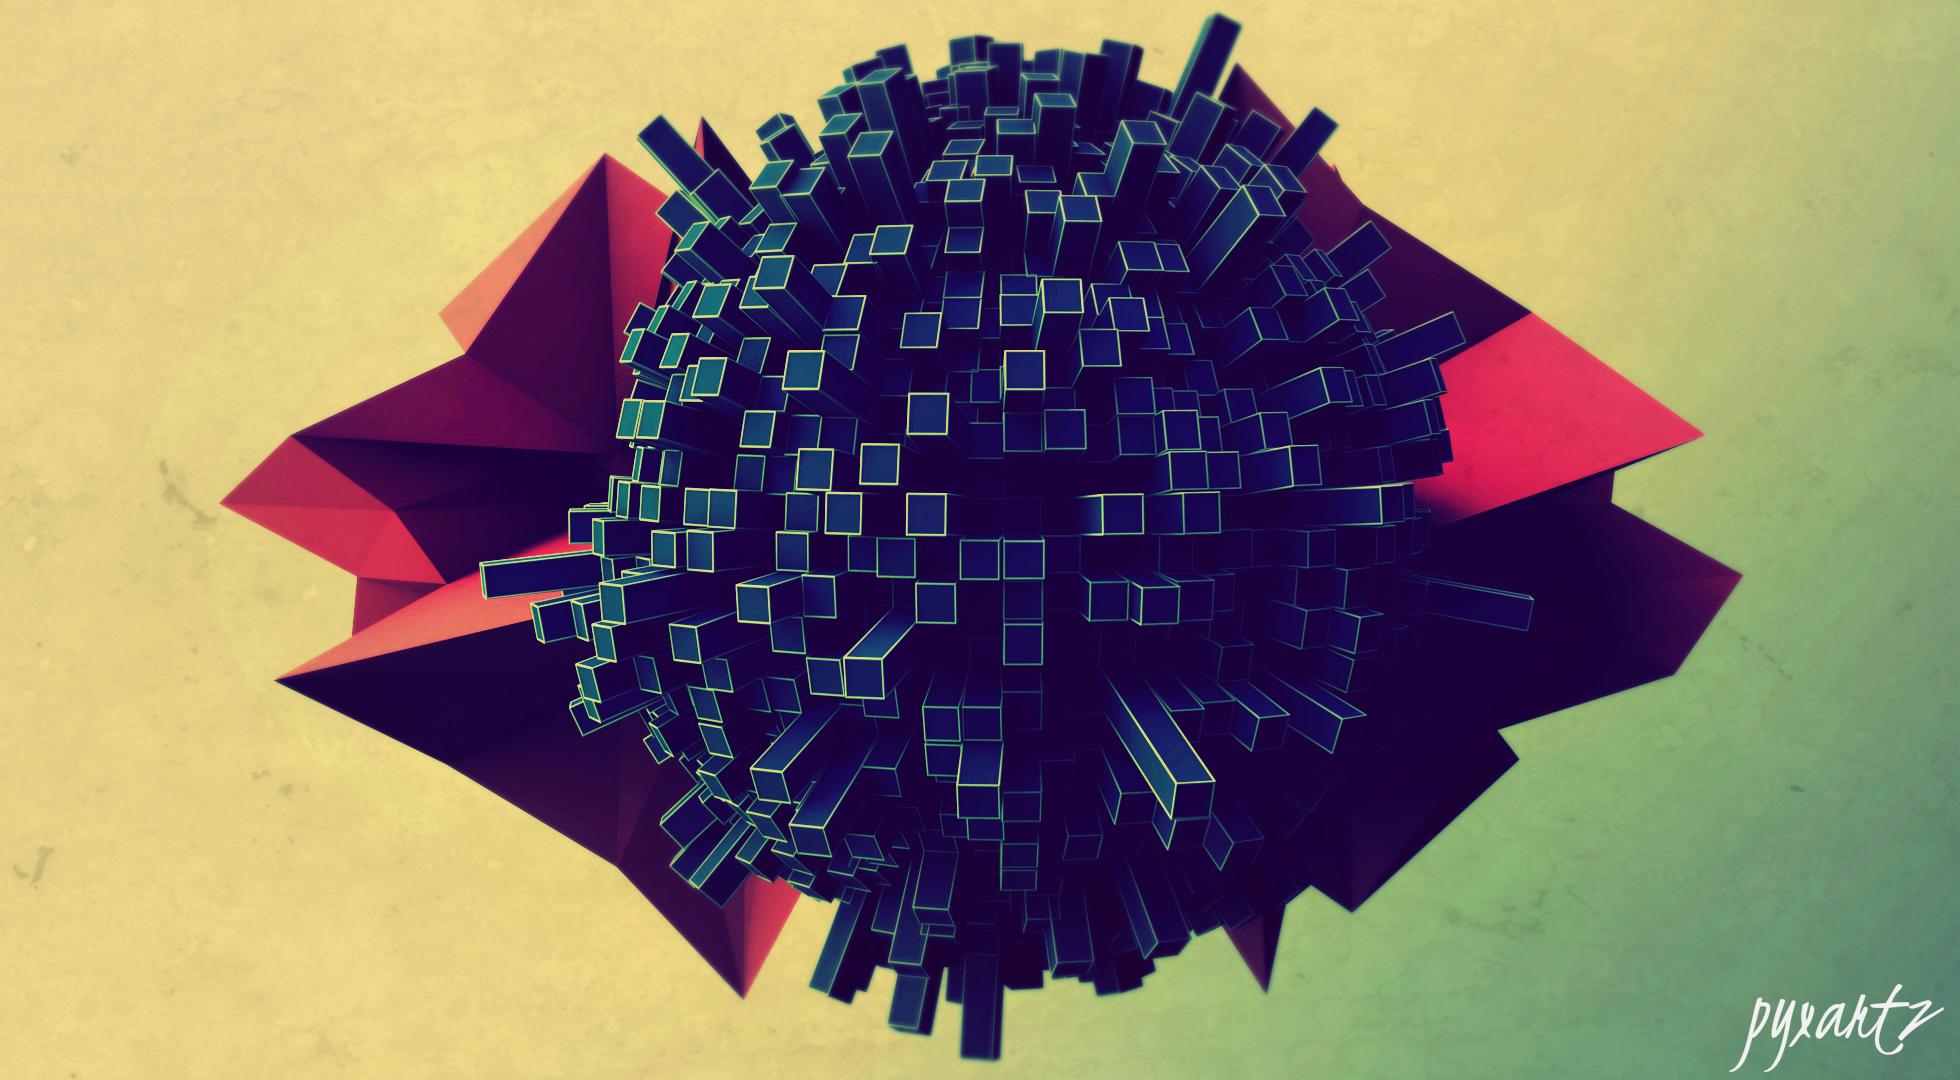 abstract wallpaper #6pyxartz on deviantart